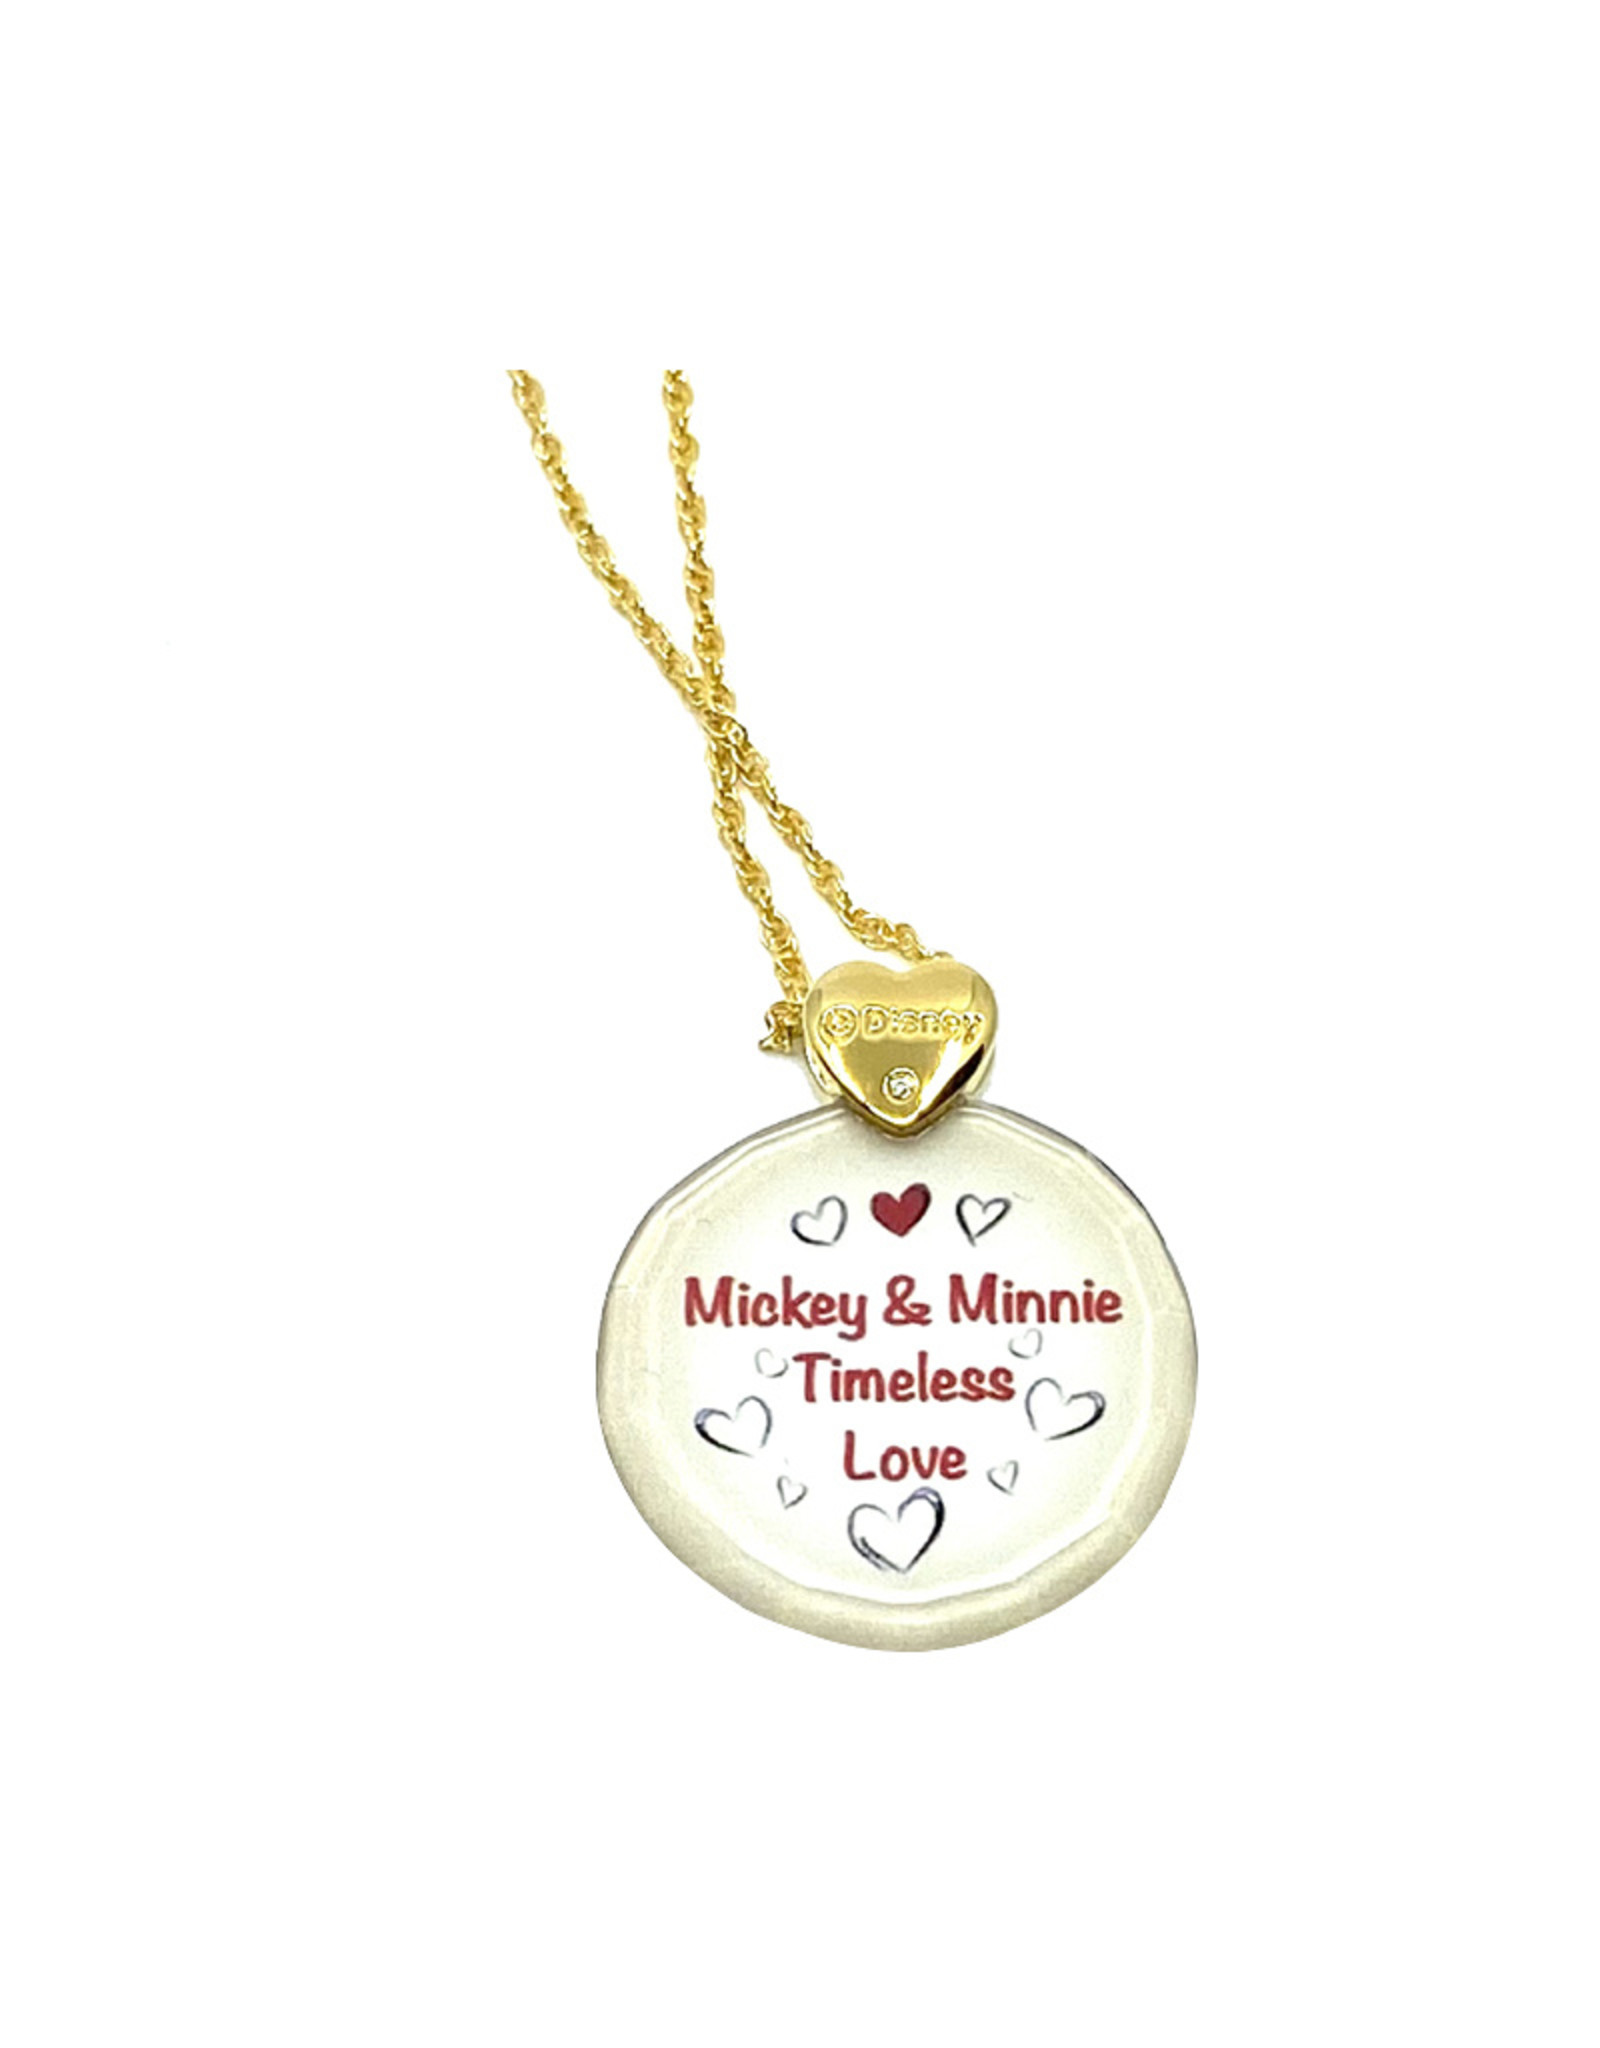 Disney Disney ( Pendant ) Mickey and Minnie Timeless Love